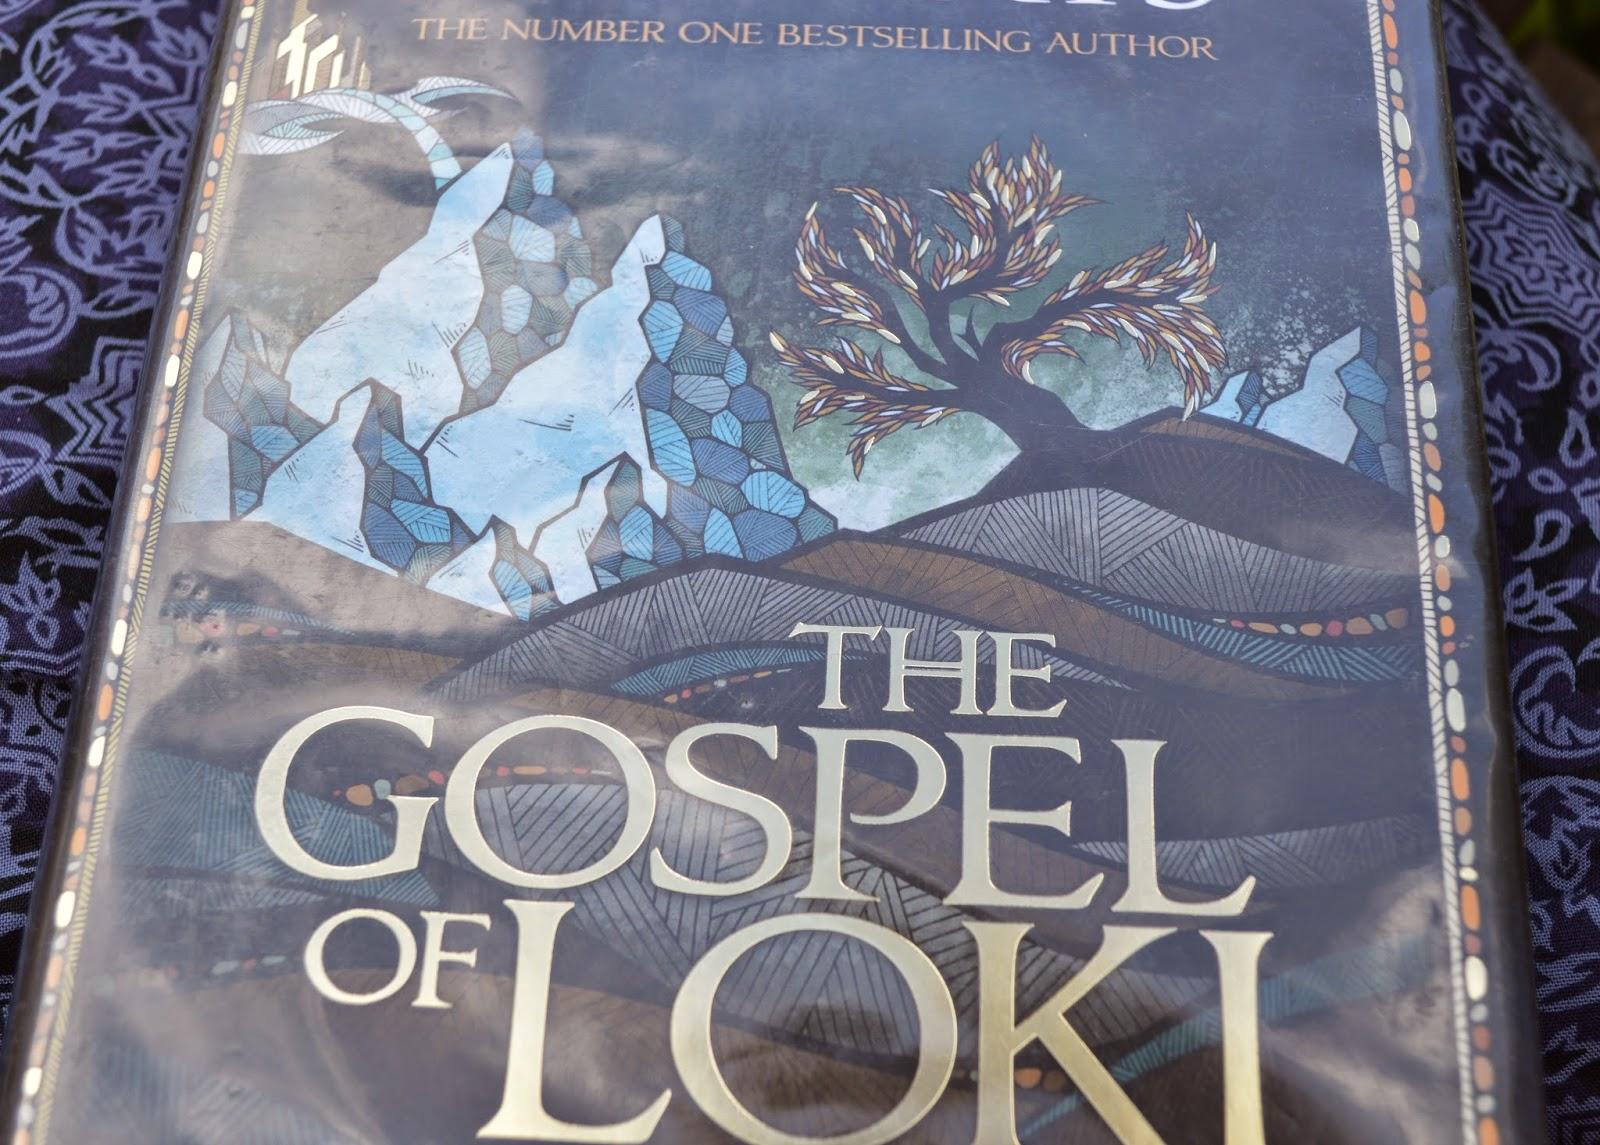 ISBN; 9781473202351,Joanne Harris, The Gospel of Loki, Norse mythology, gods, trickster, book, review, fiction, hardback, UK edition